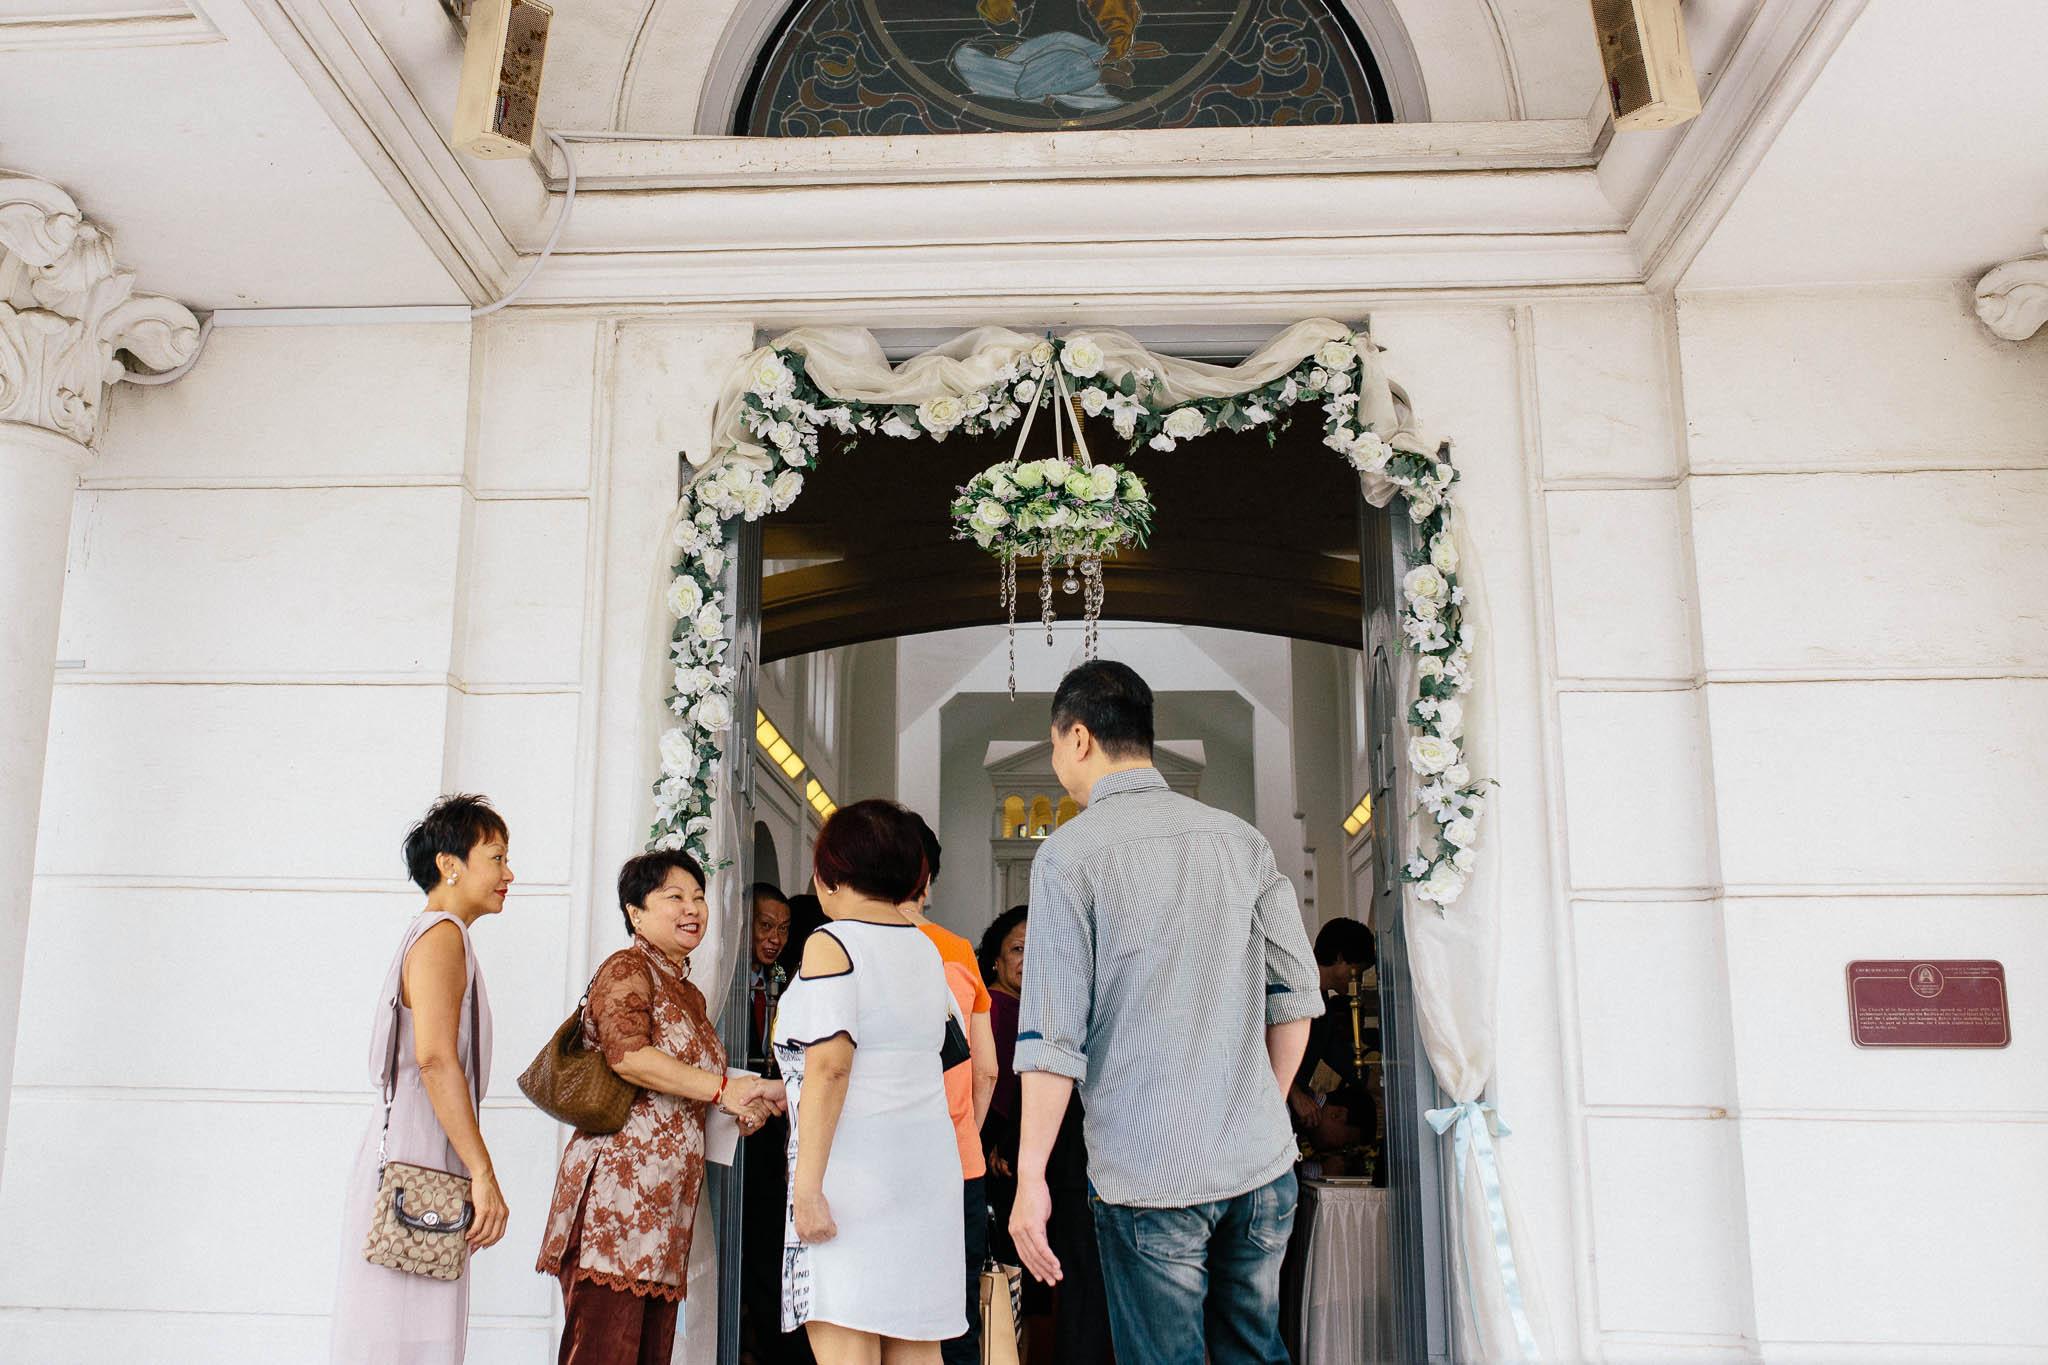 singapore-wedding-photographer-malay-indian-pre-wedding-travel-wmt-2015-jeremy-larissa-20.jpg